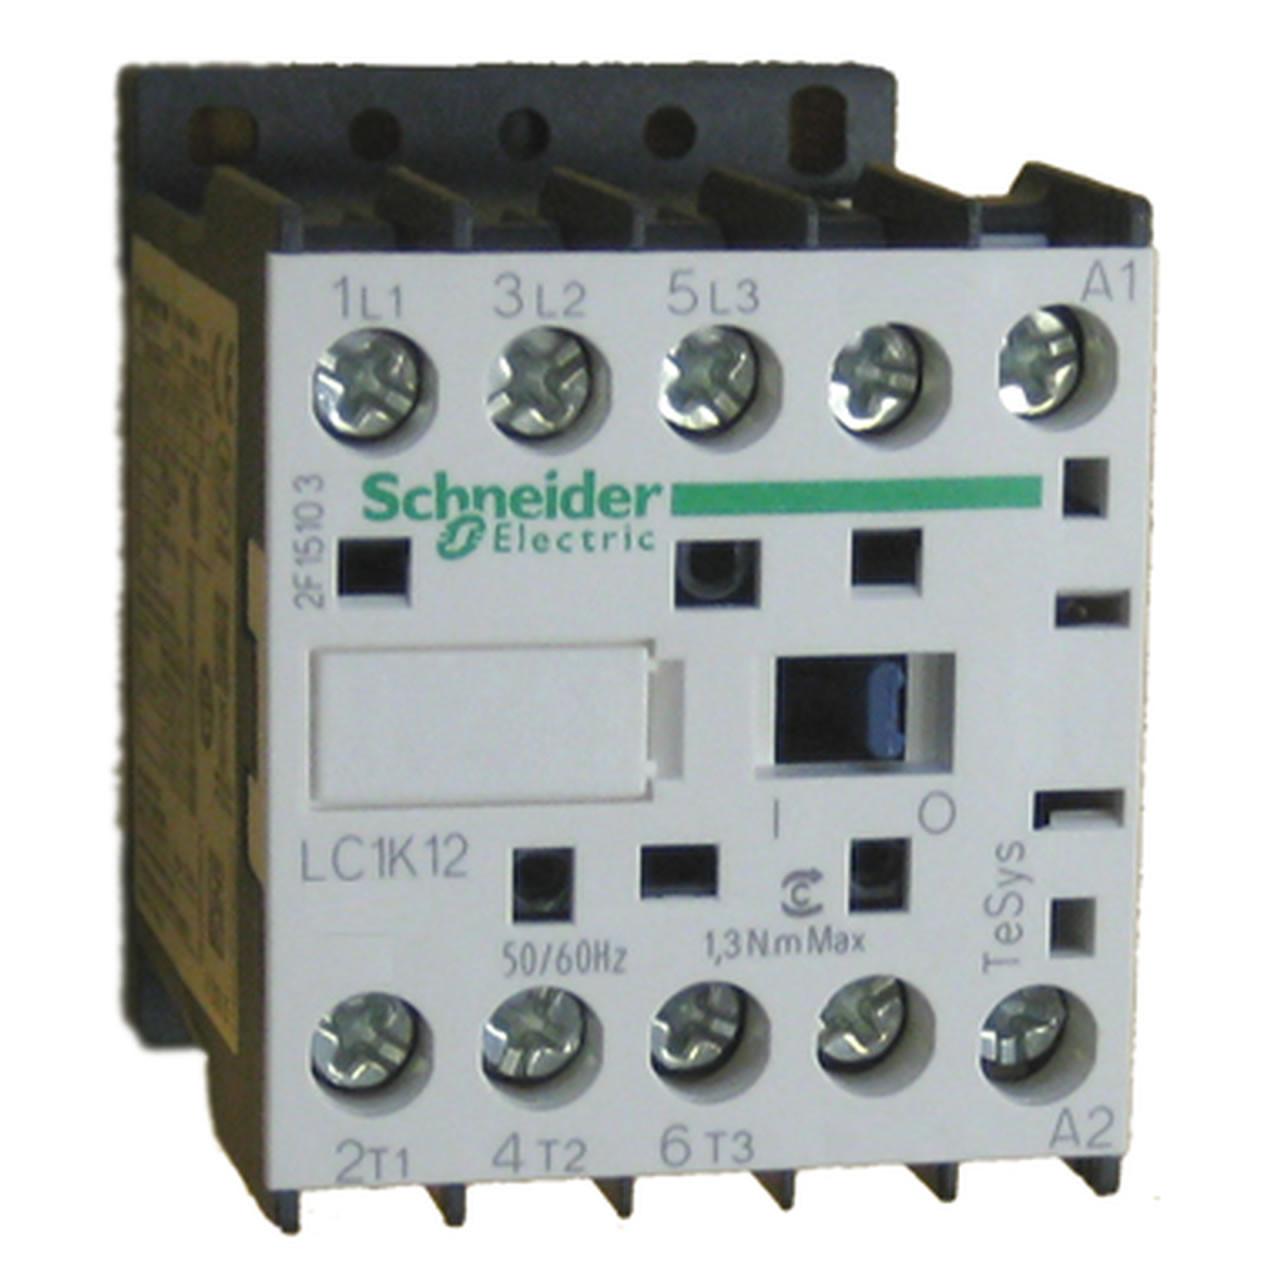 Schneider Electric LC1K1201N7 contactor